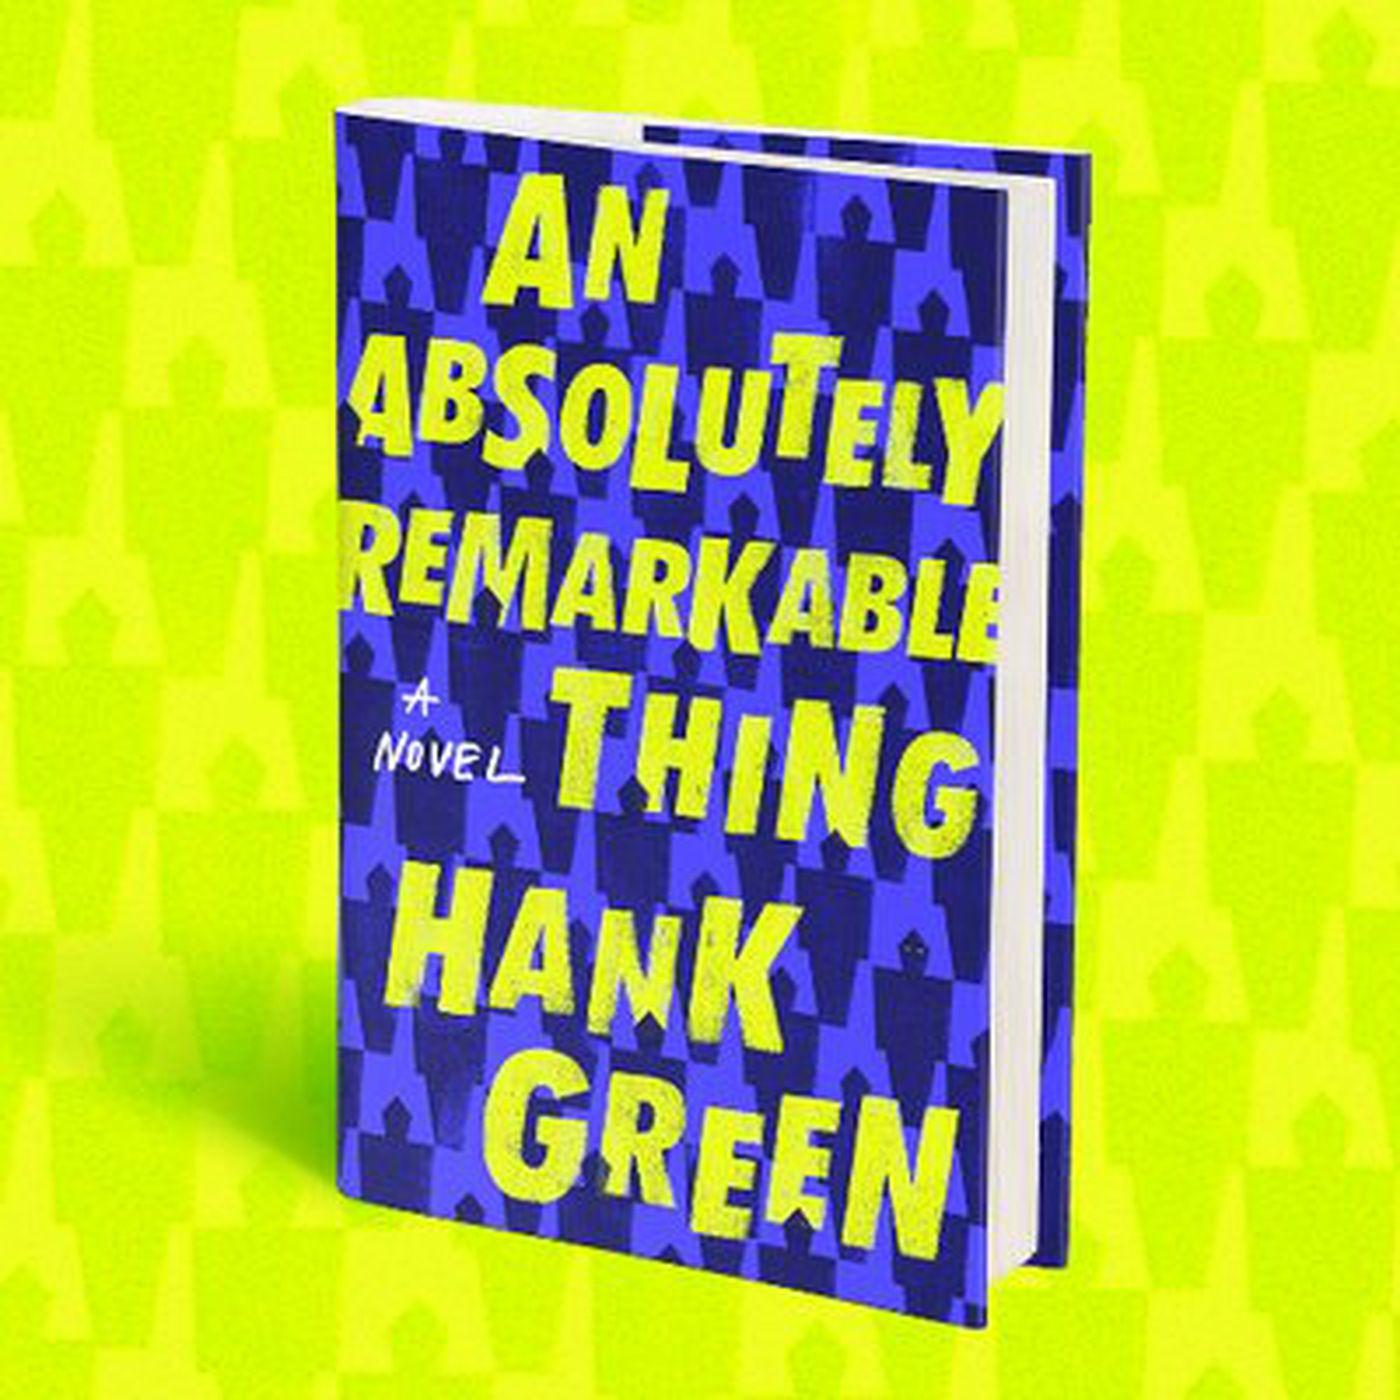 YouTuber Hank Green on art, giant robots, and internet fame